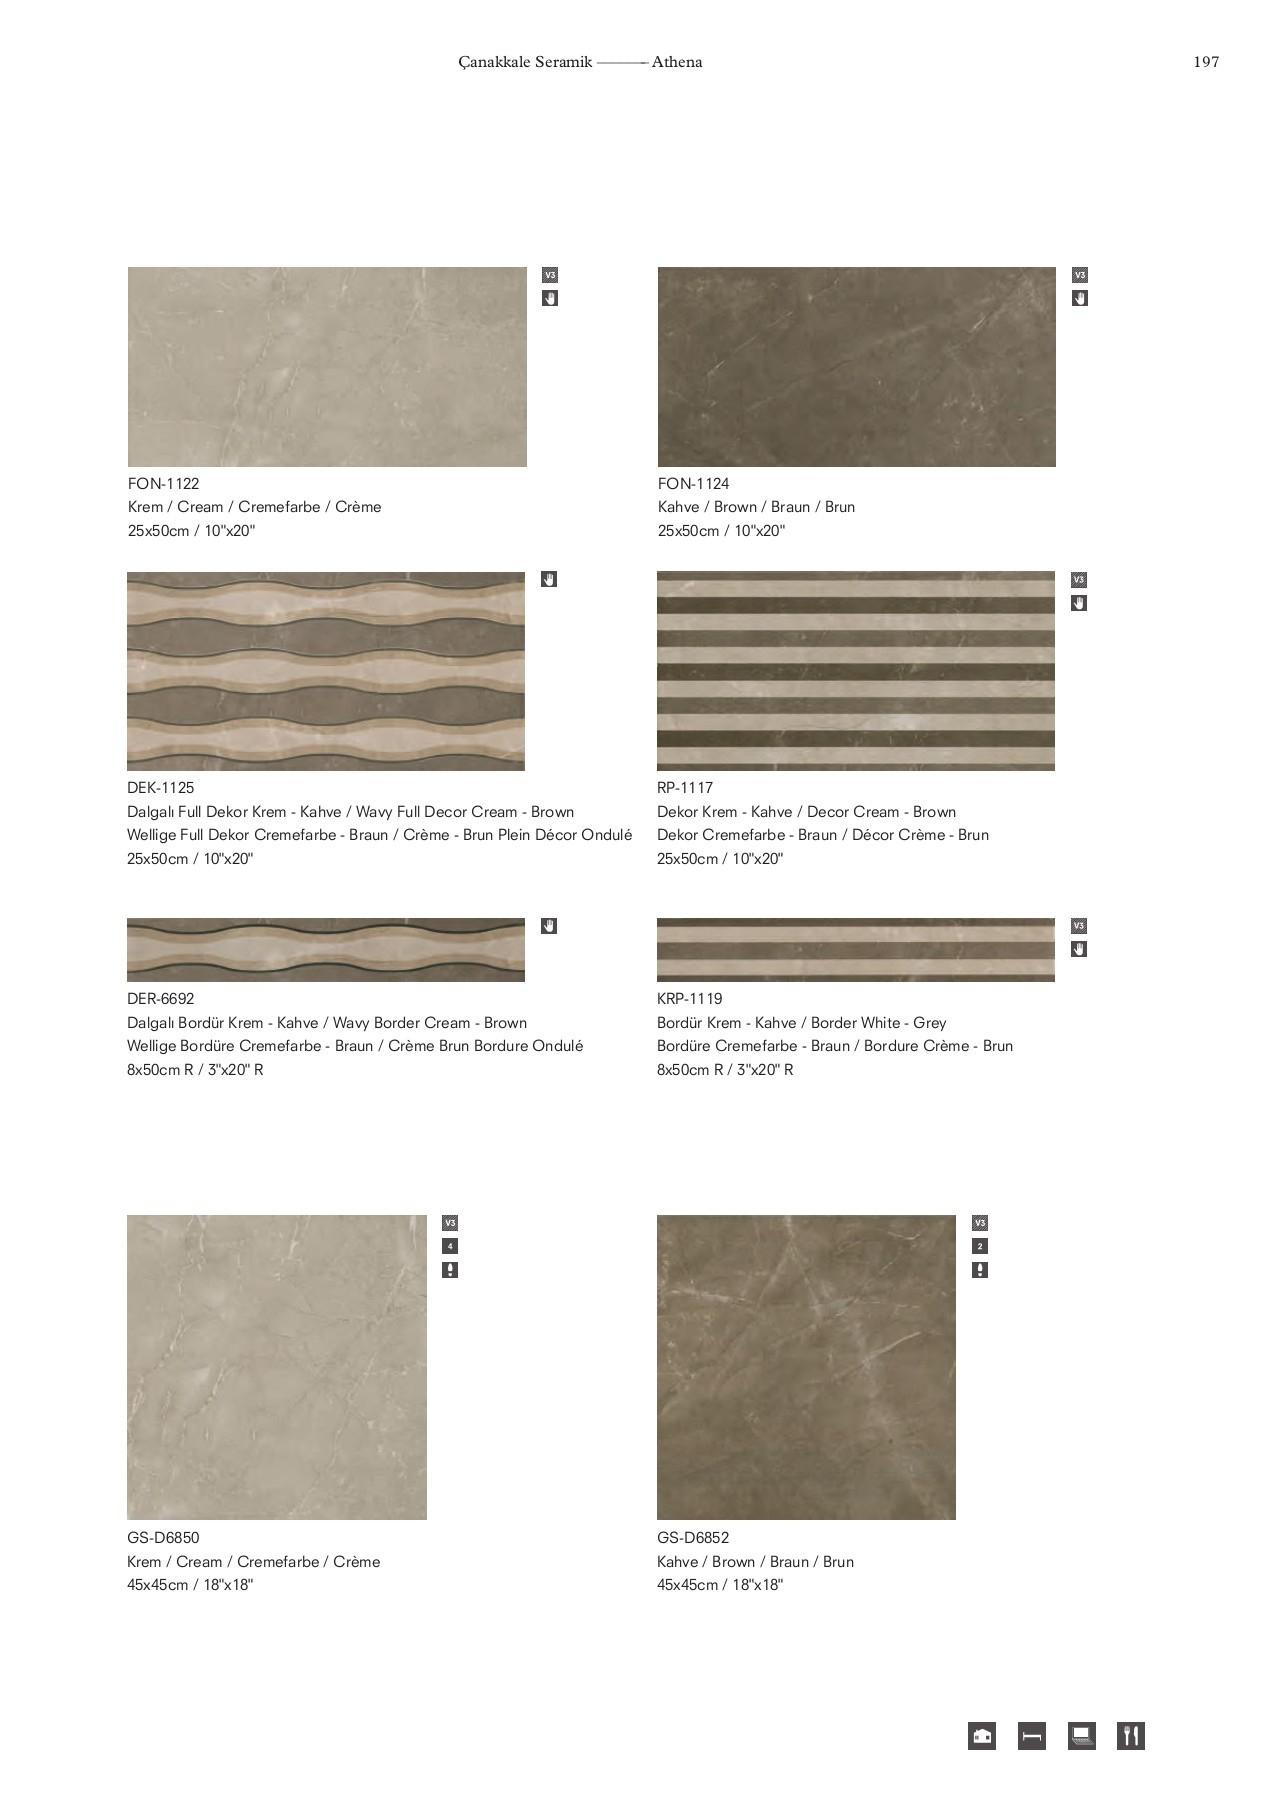 Baş Yapı 2017 Çanakkale Seramik Genel Kataloğu Pages 201 ... intérieur Salon De Jardin Blanc Design